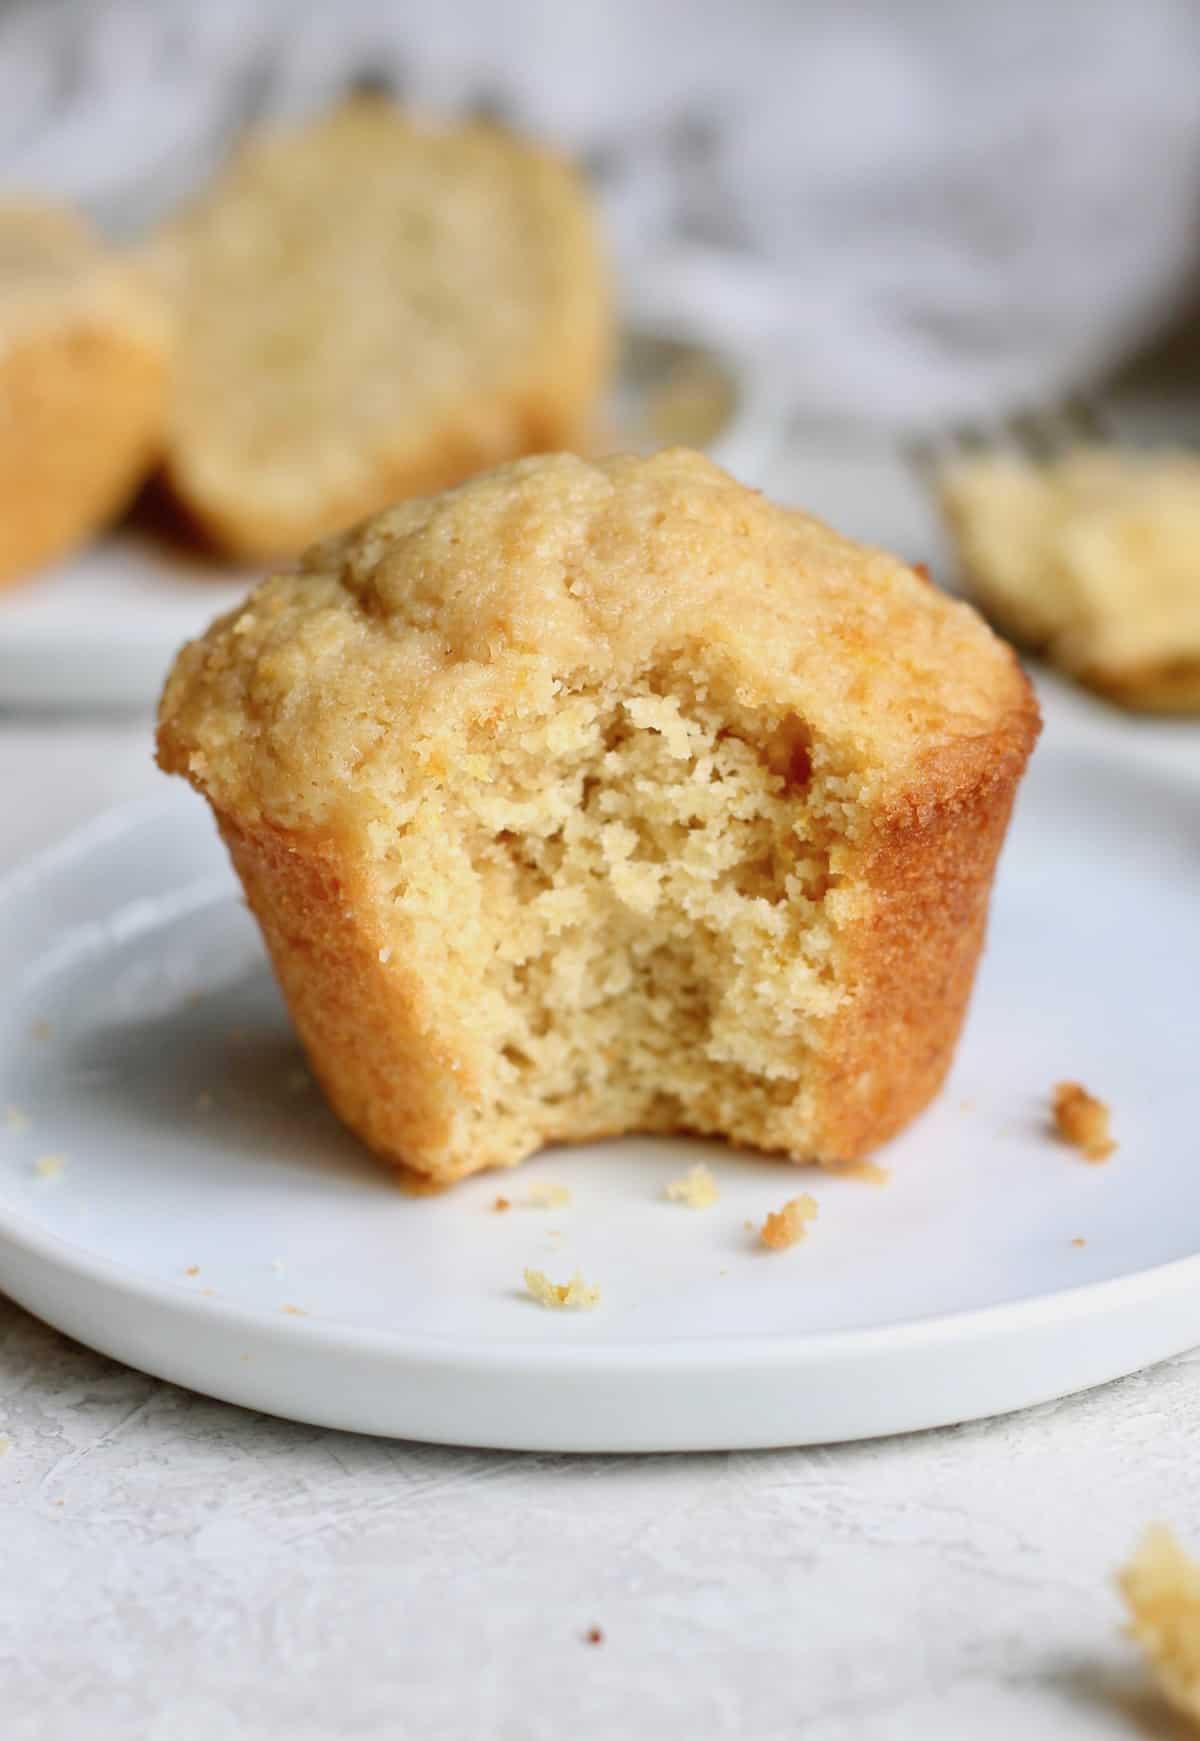 orange muffin on small white plate